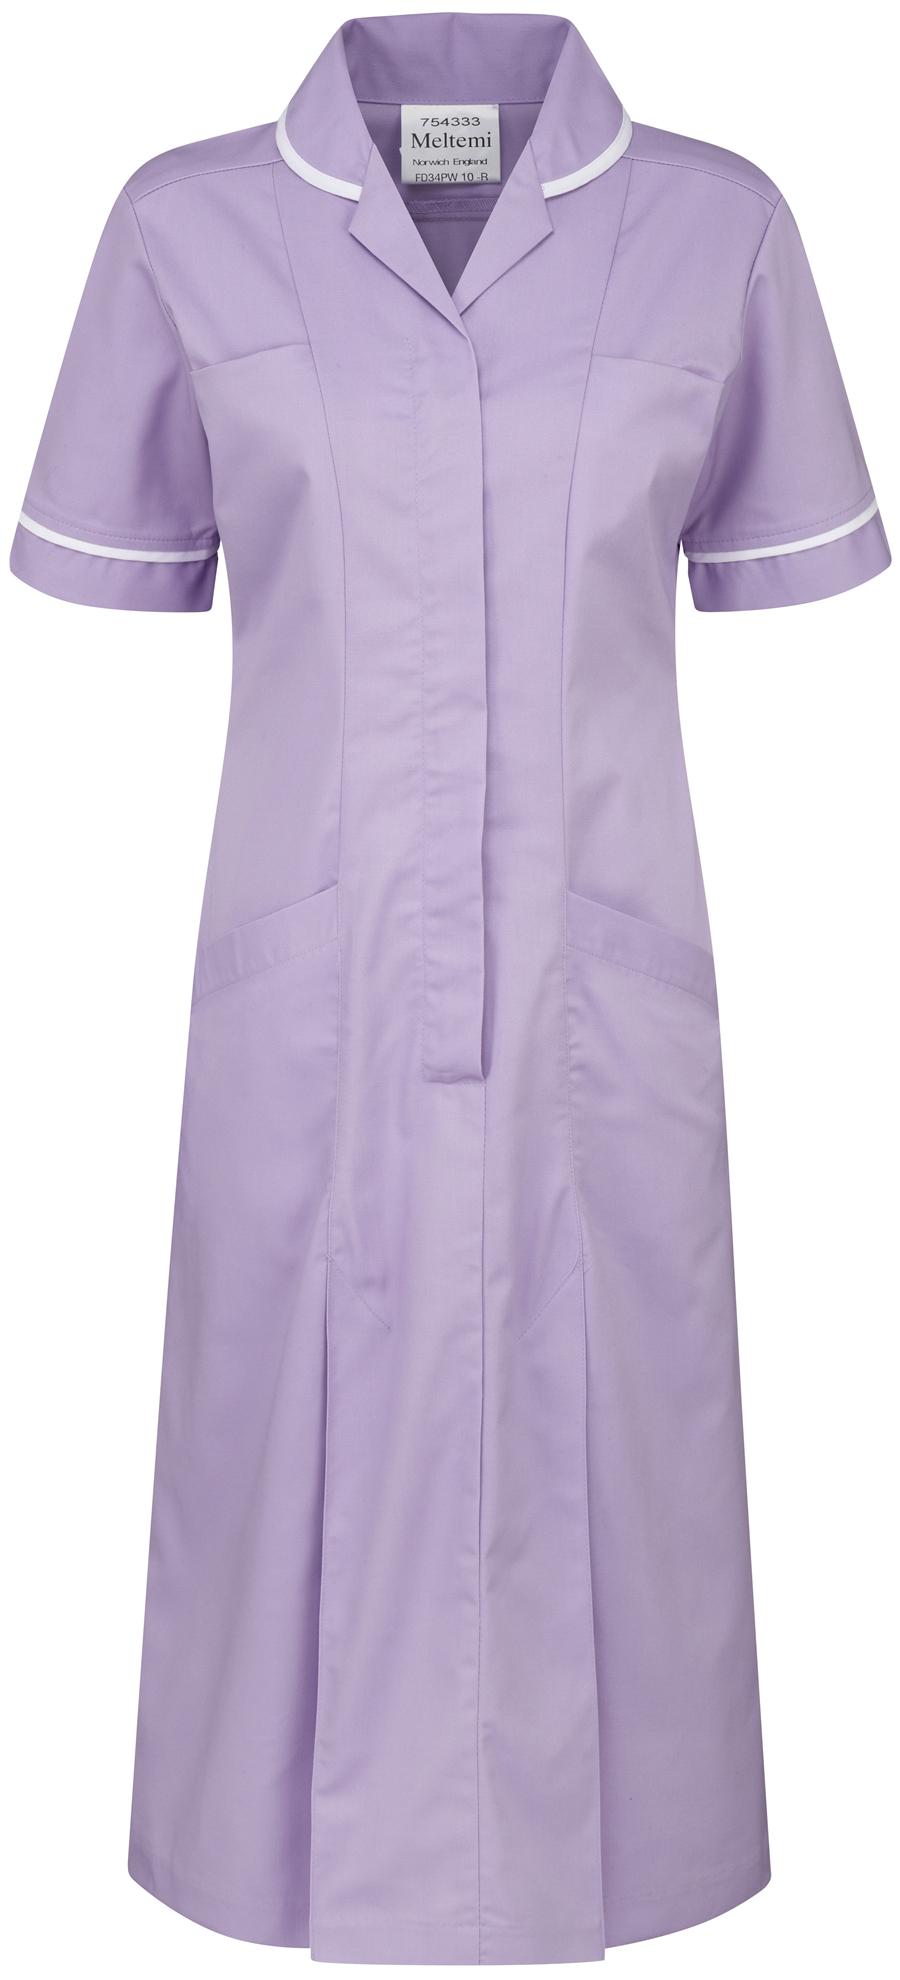 Picture of Plain Colour Dress - Lilac/White